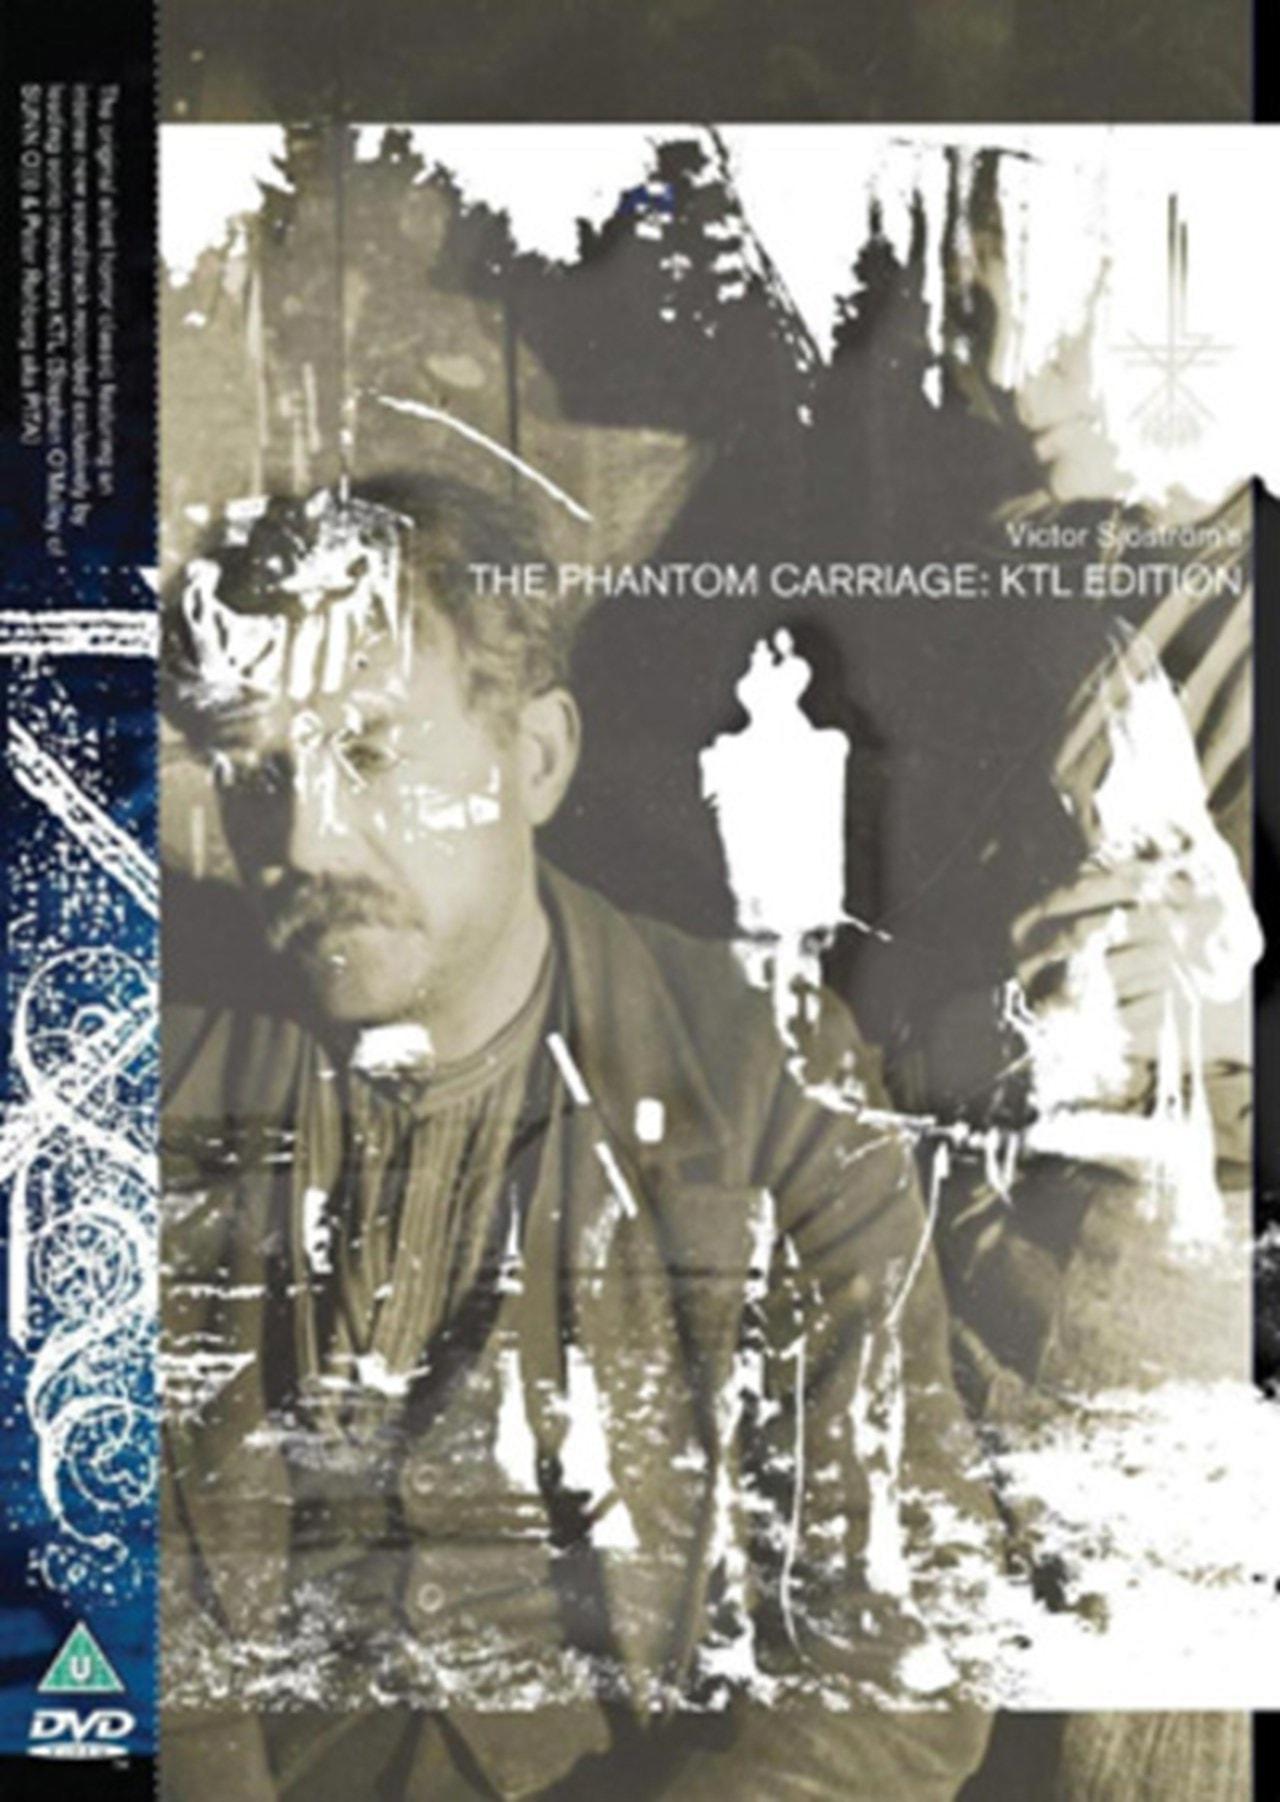 The Phantom Carriage - 1